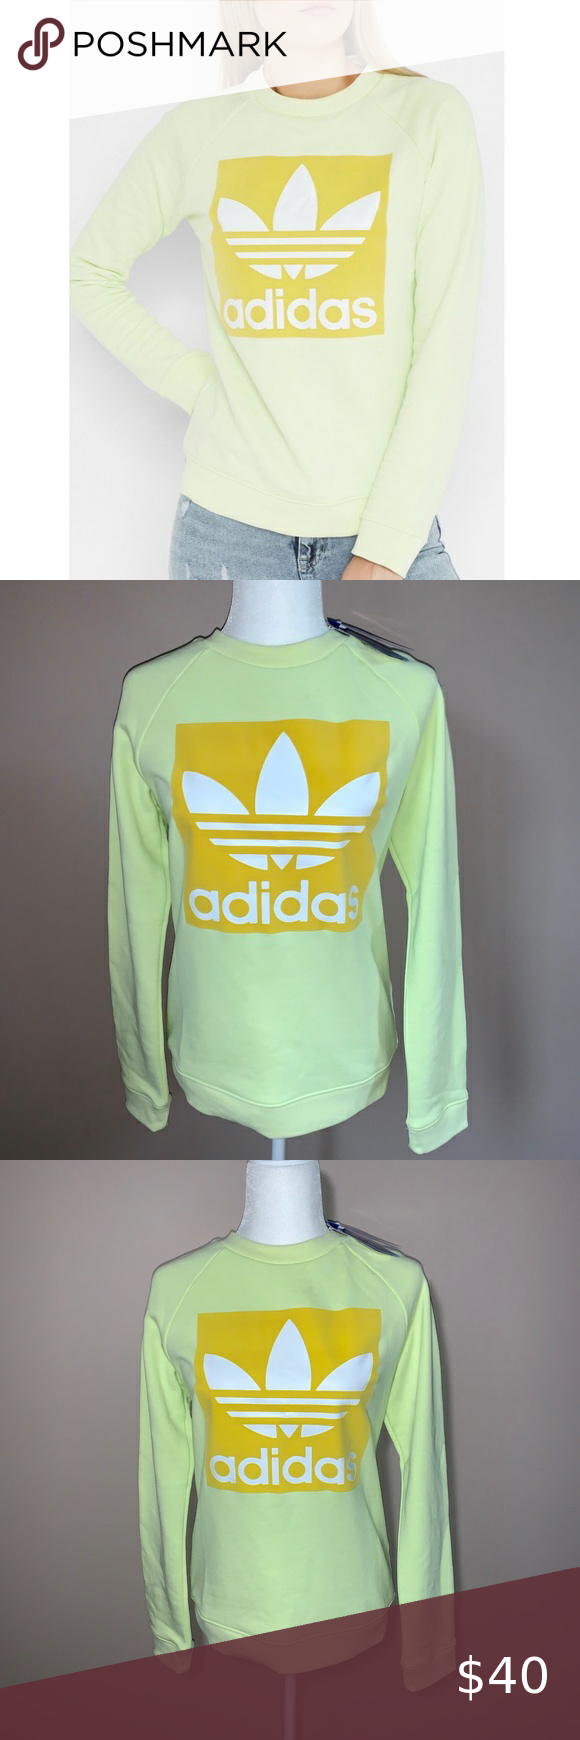 Women S Adidas Trefoil Crew Nwt Sold Adidas Trefoil Crew Neck Sweatshirt Adidas Tops [ 1740 x 580 Pixel ]